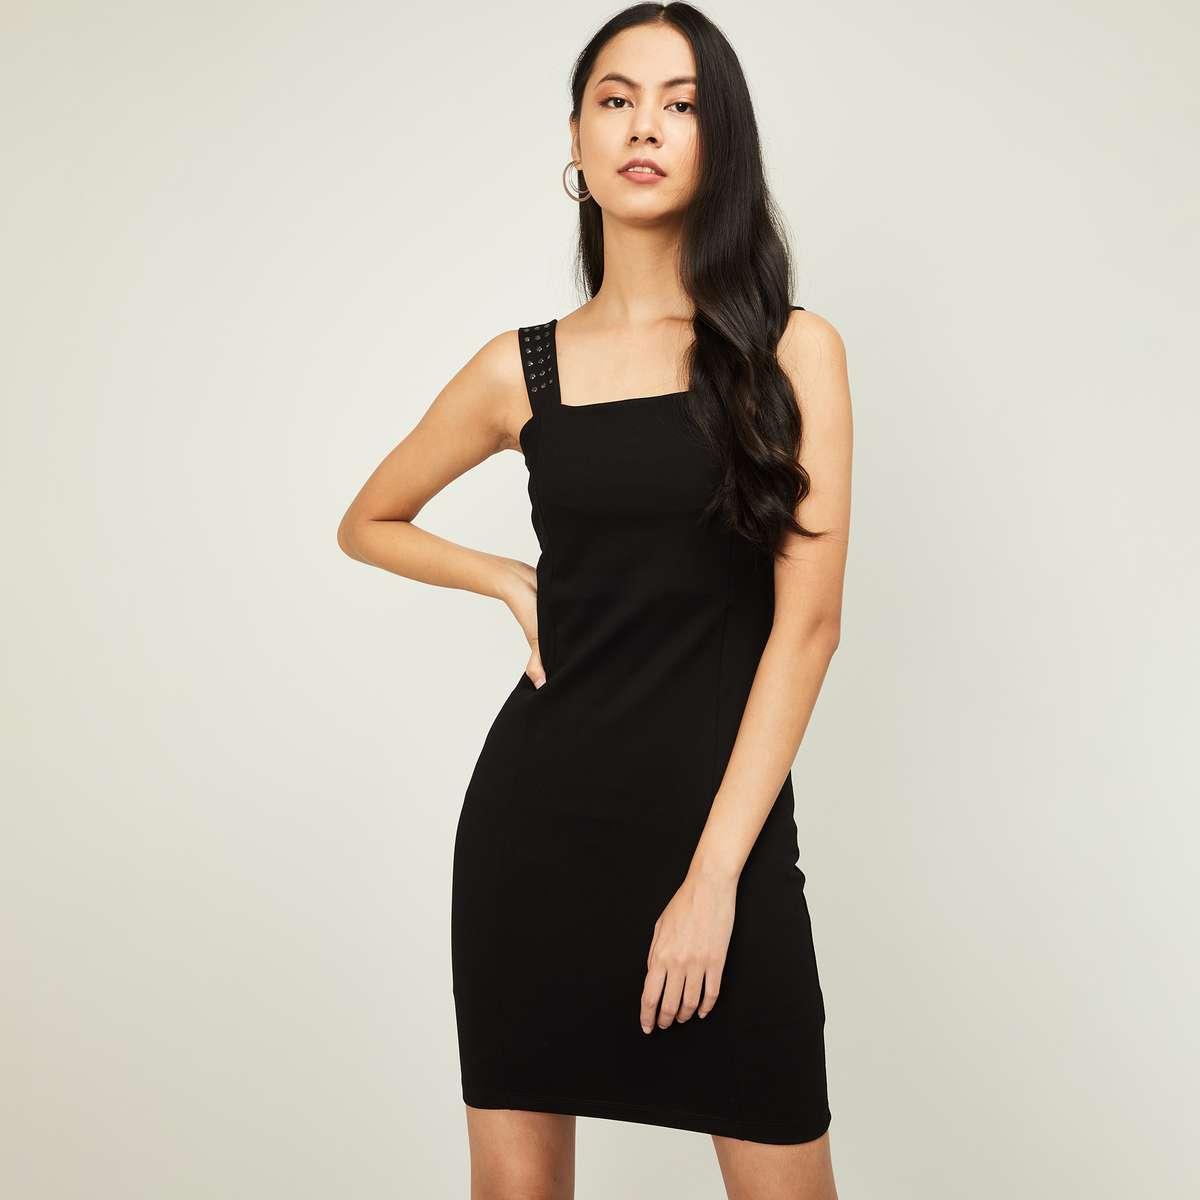 2.GINGER Women Solid Sheath Dress